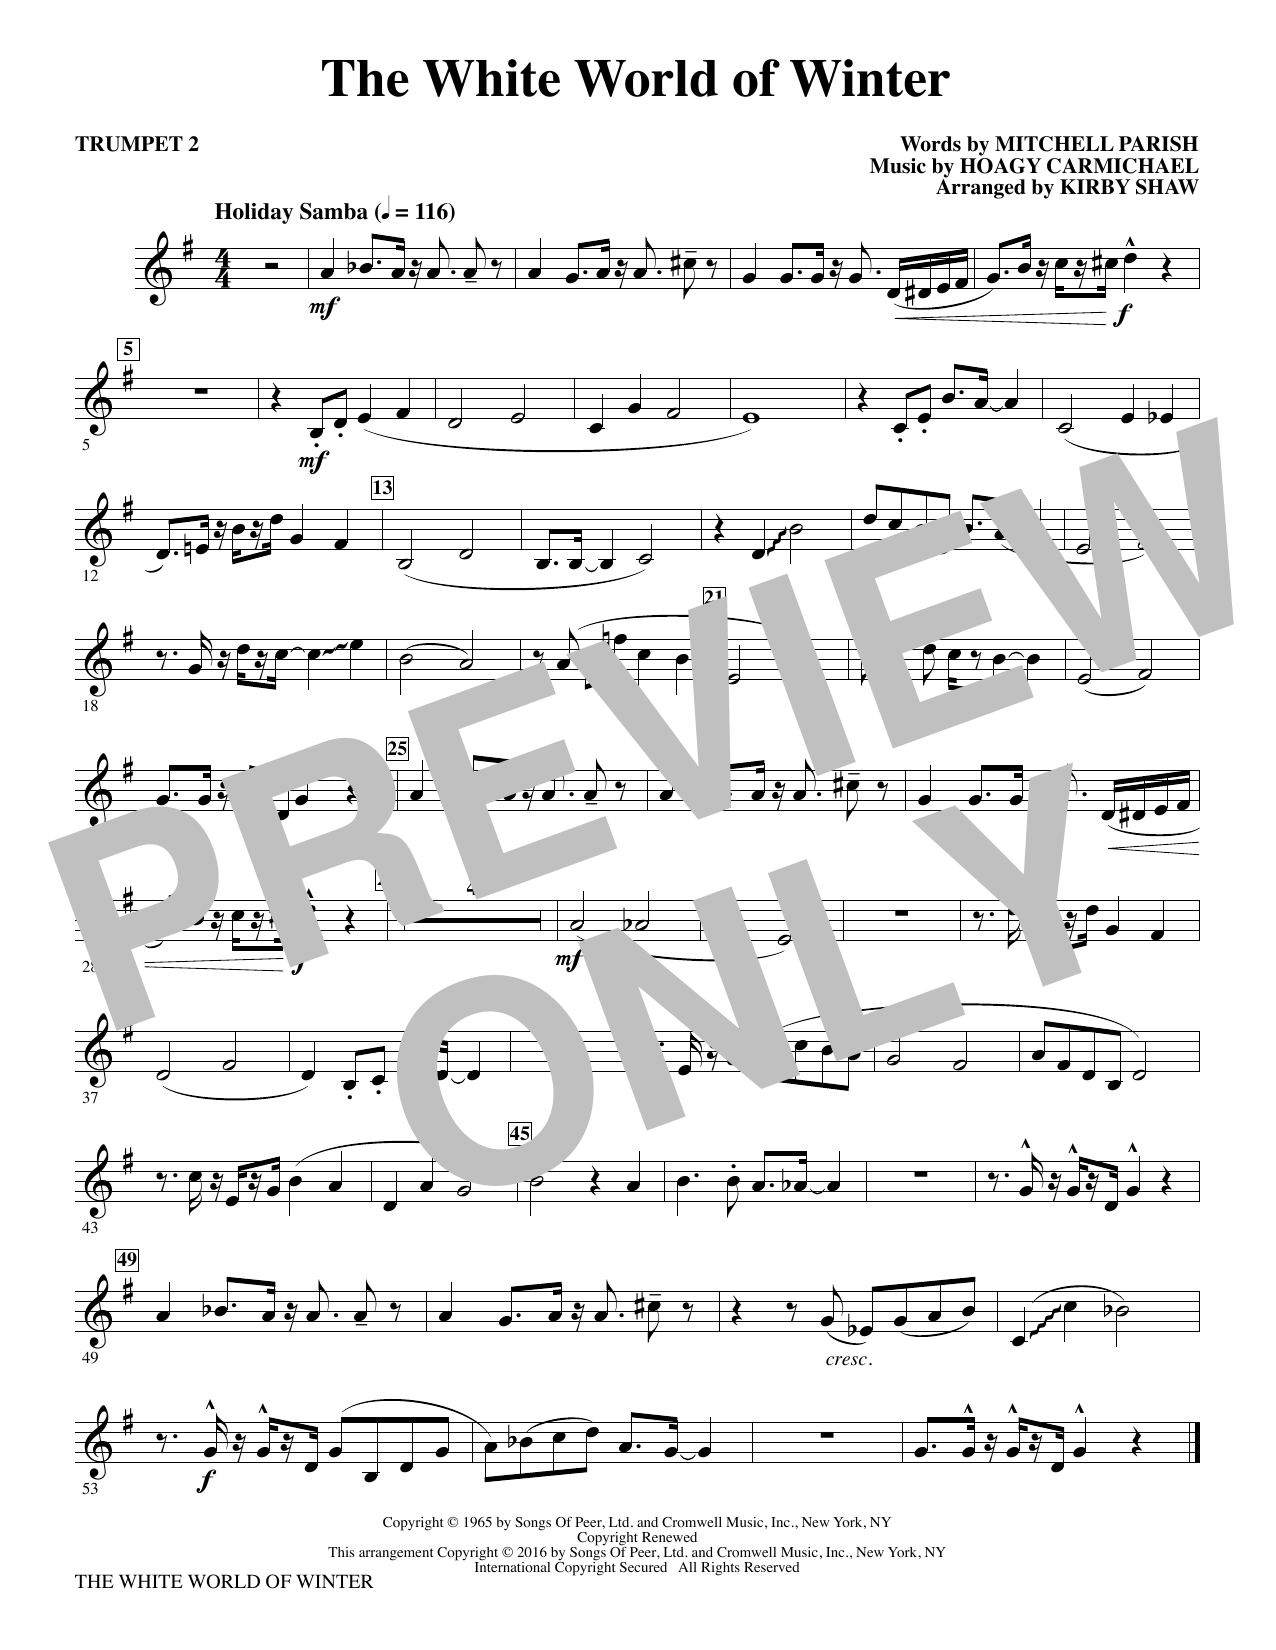 The White World of Winter - Trumpet 2 Sheet Music